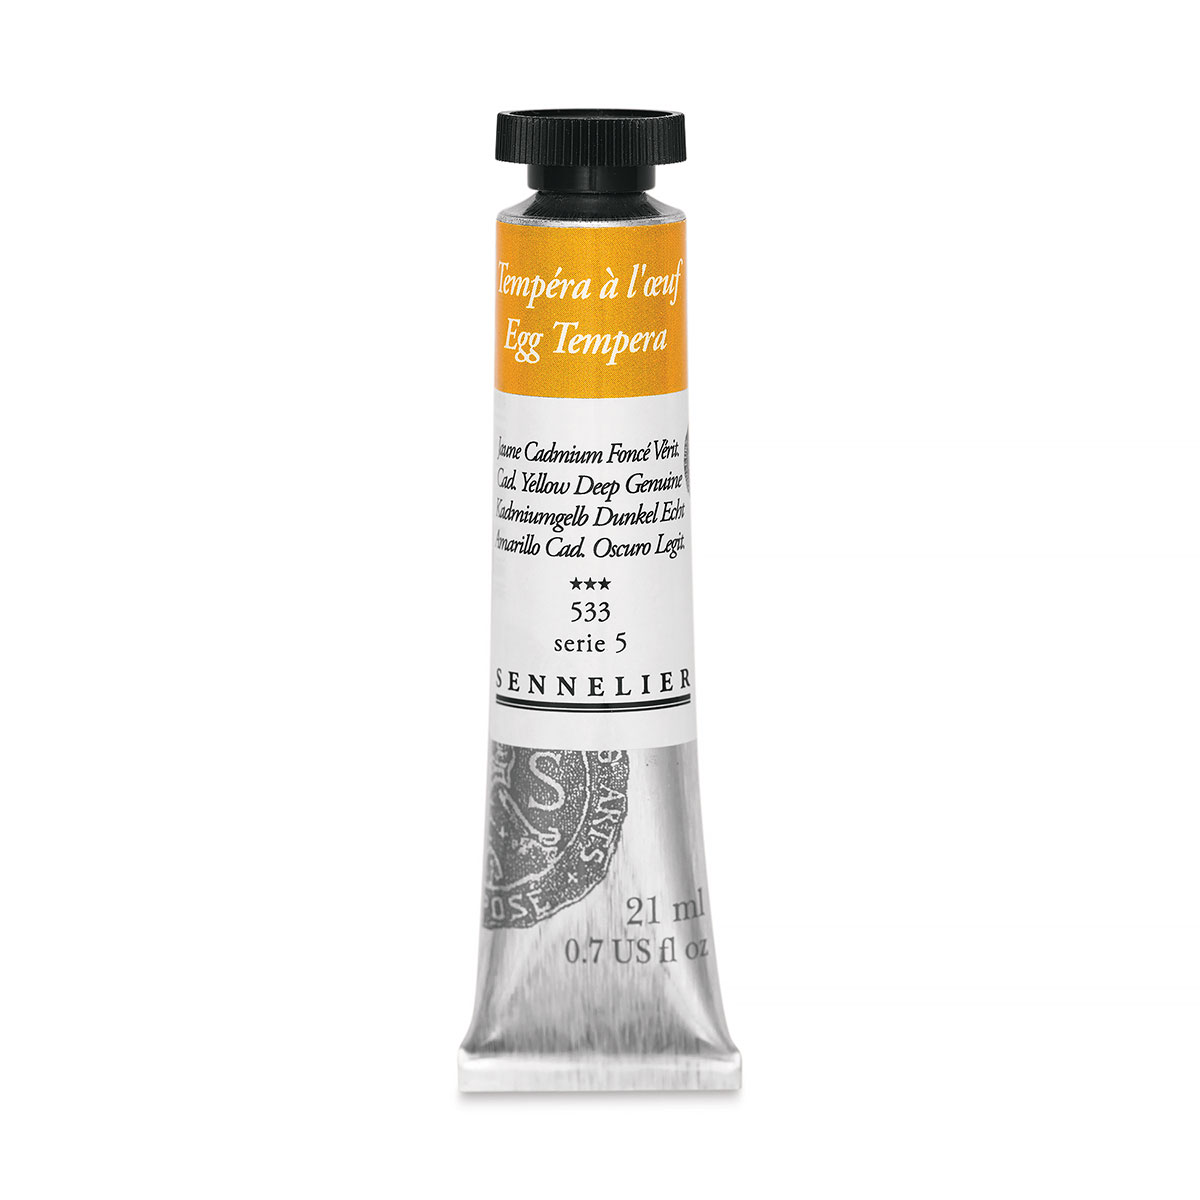 Sennelier Aritsts Egg Tempera- Cadmium Yellow Deep Genuine, 21 ml tube